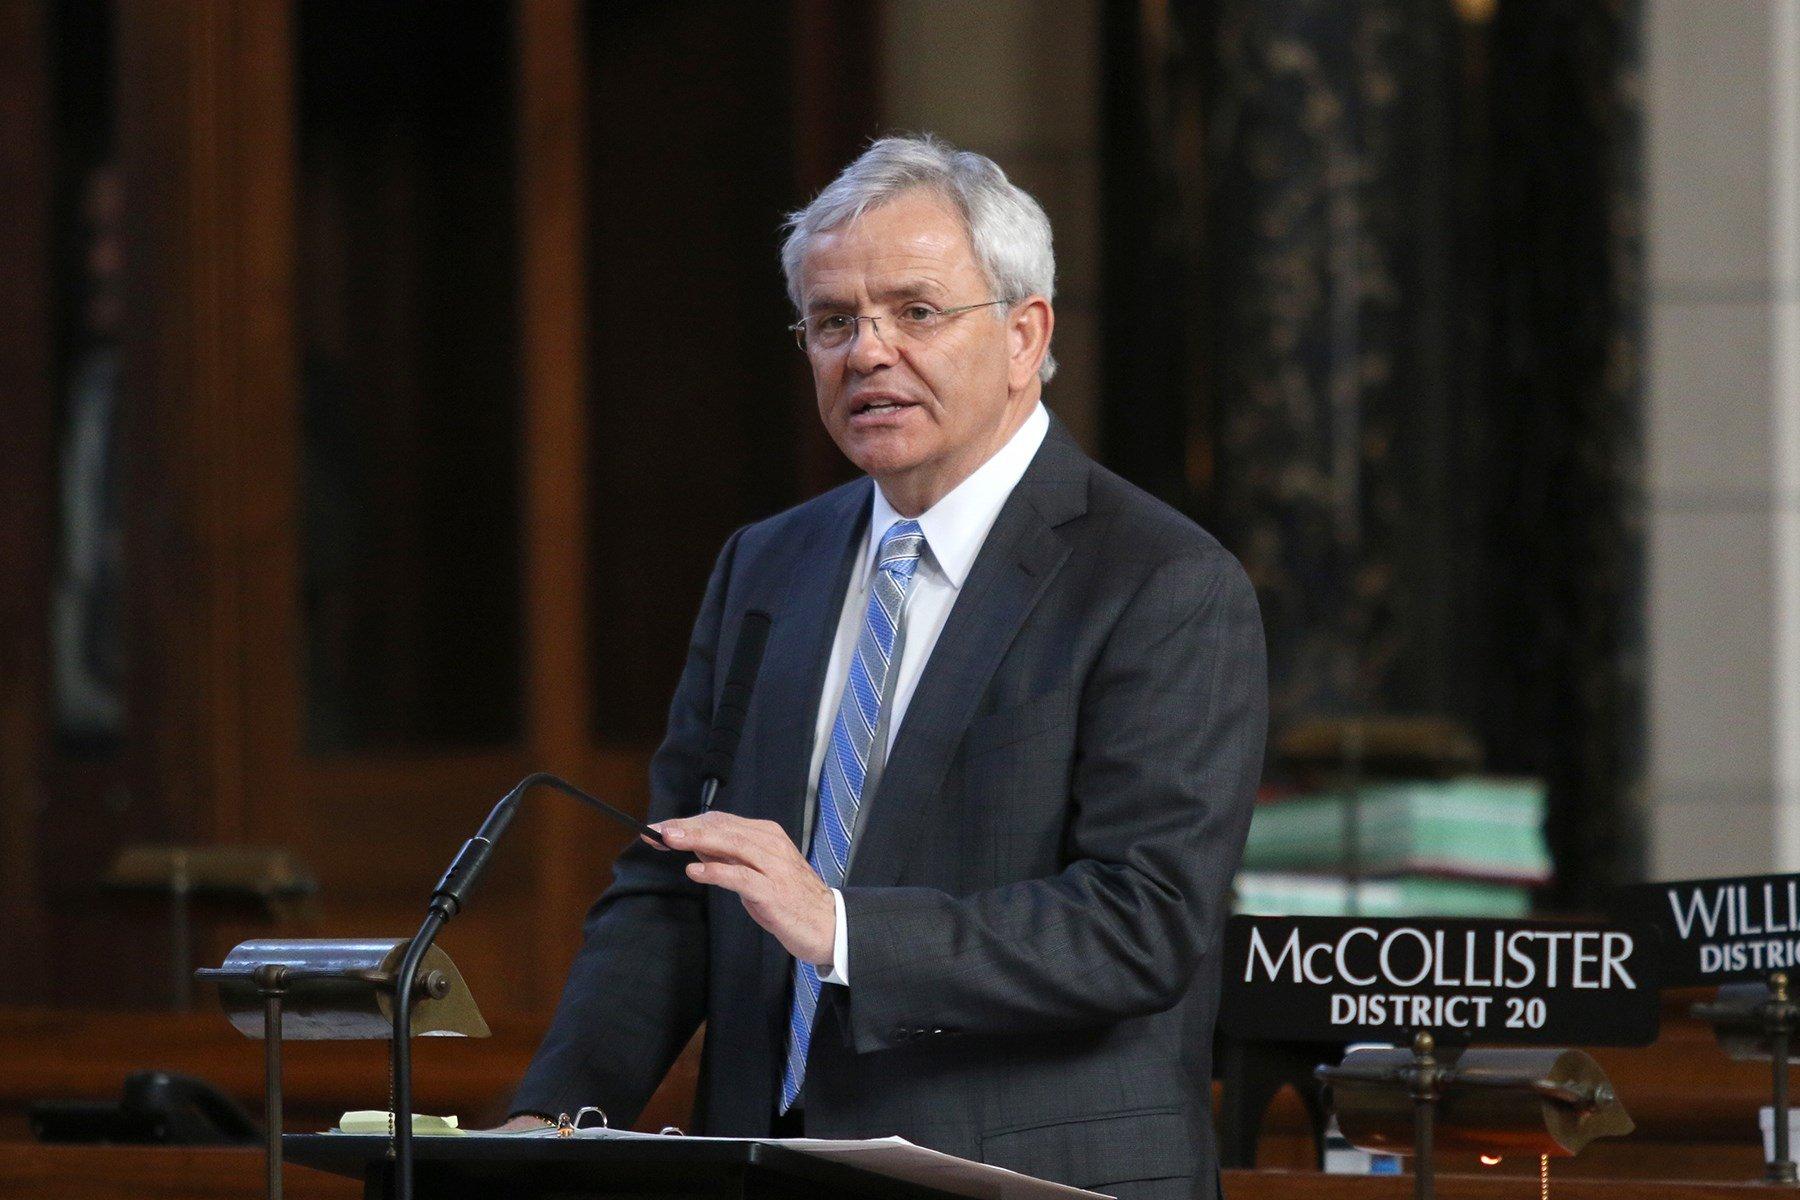 Senators OK sports betting, but not on Husker home games